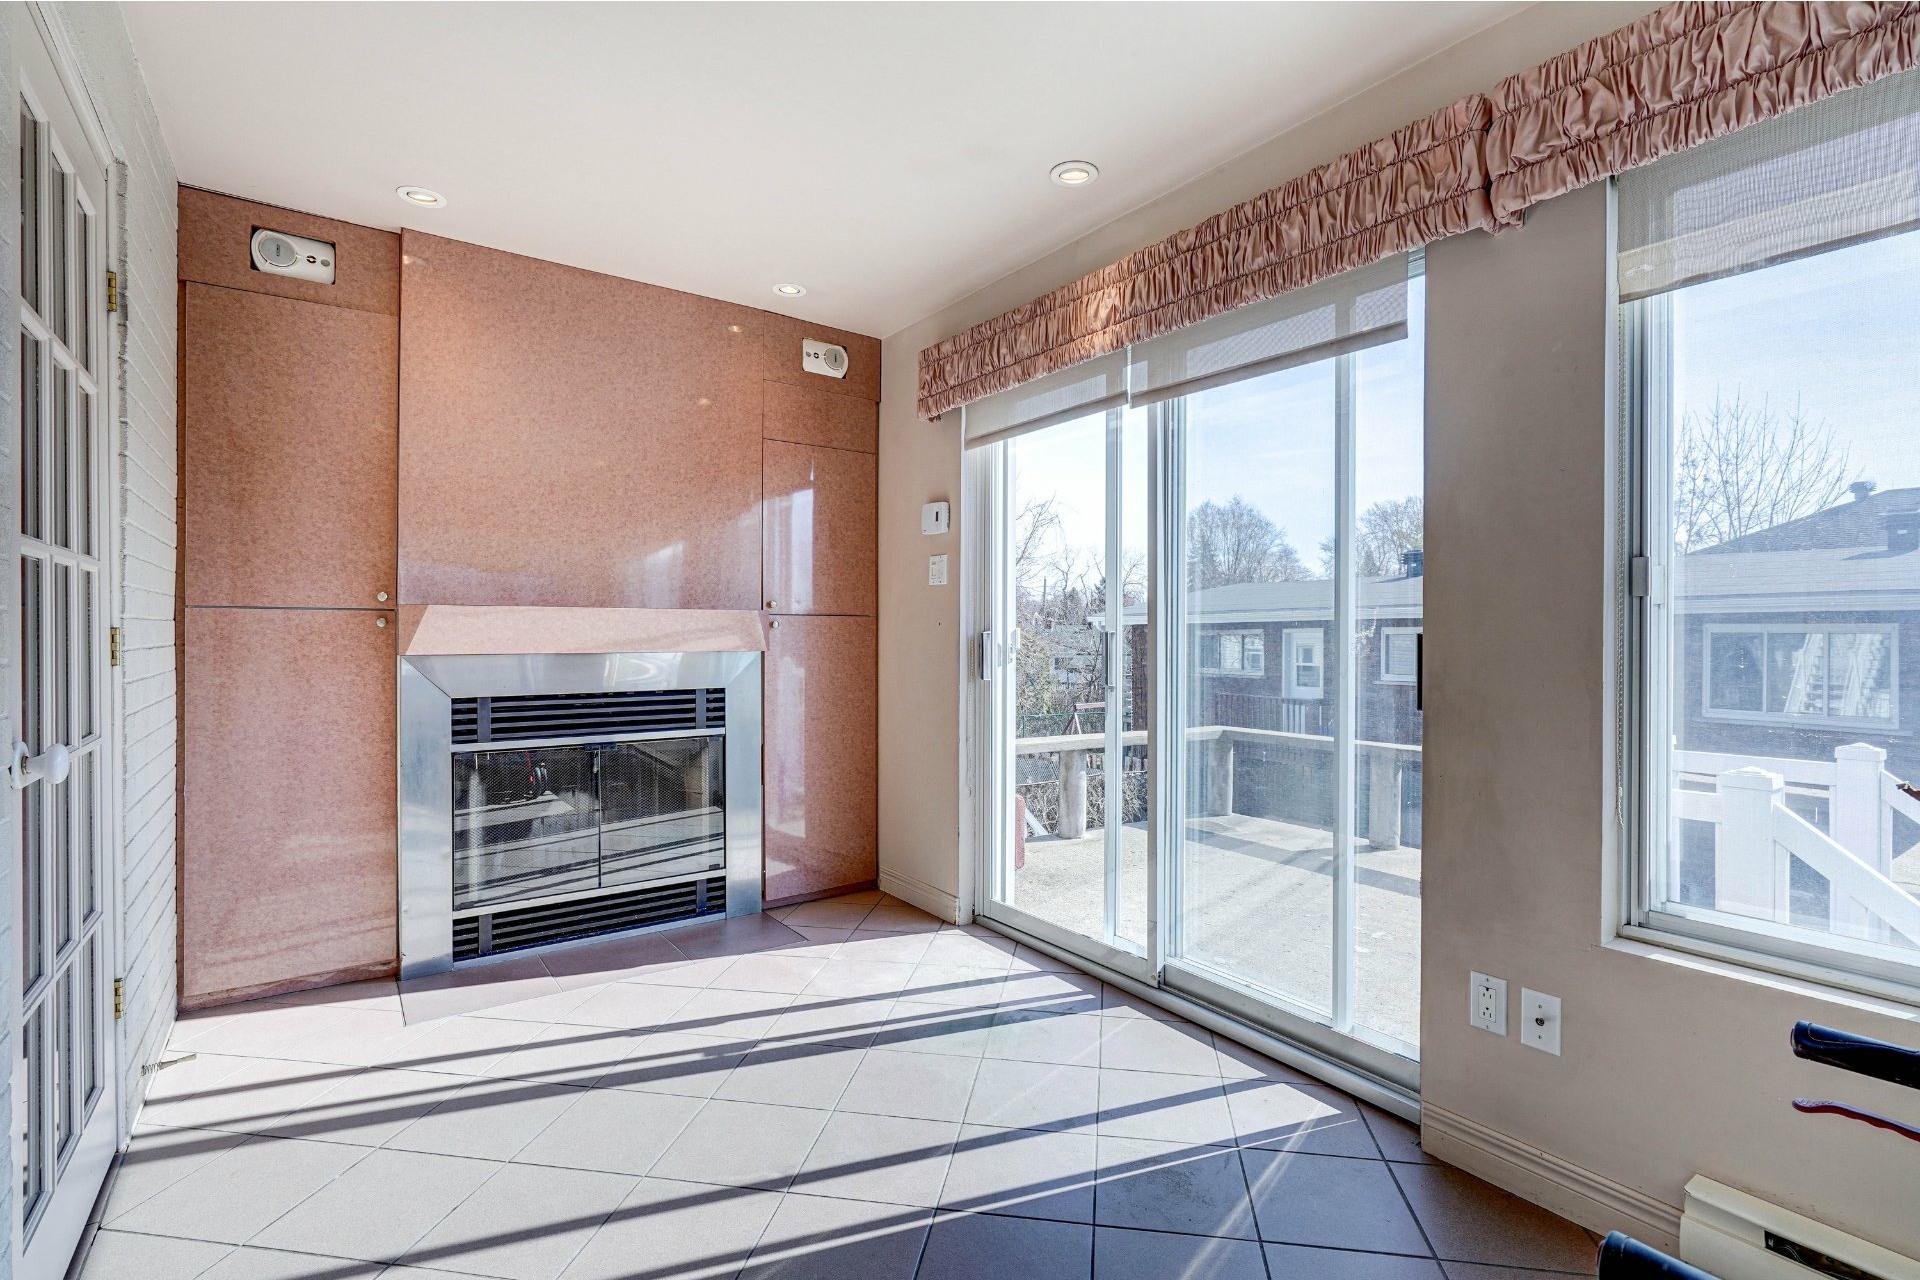 image 18 - Triplex For sale Dorval - 4 rooms